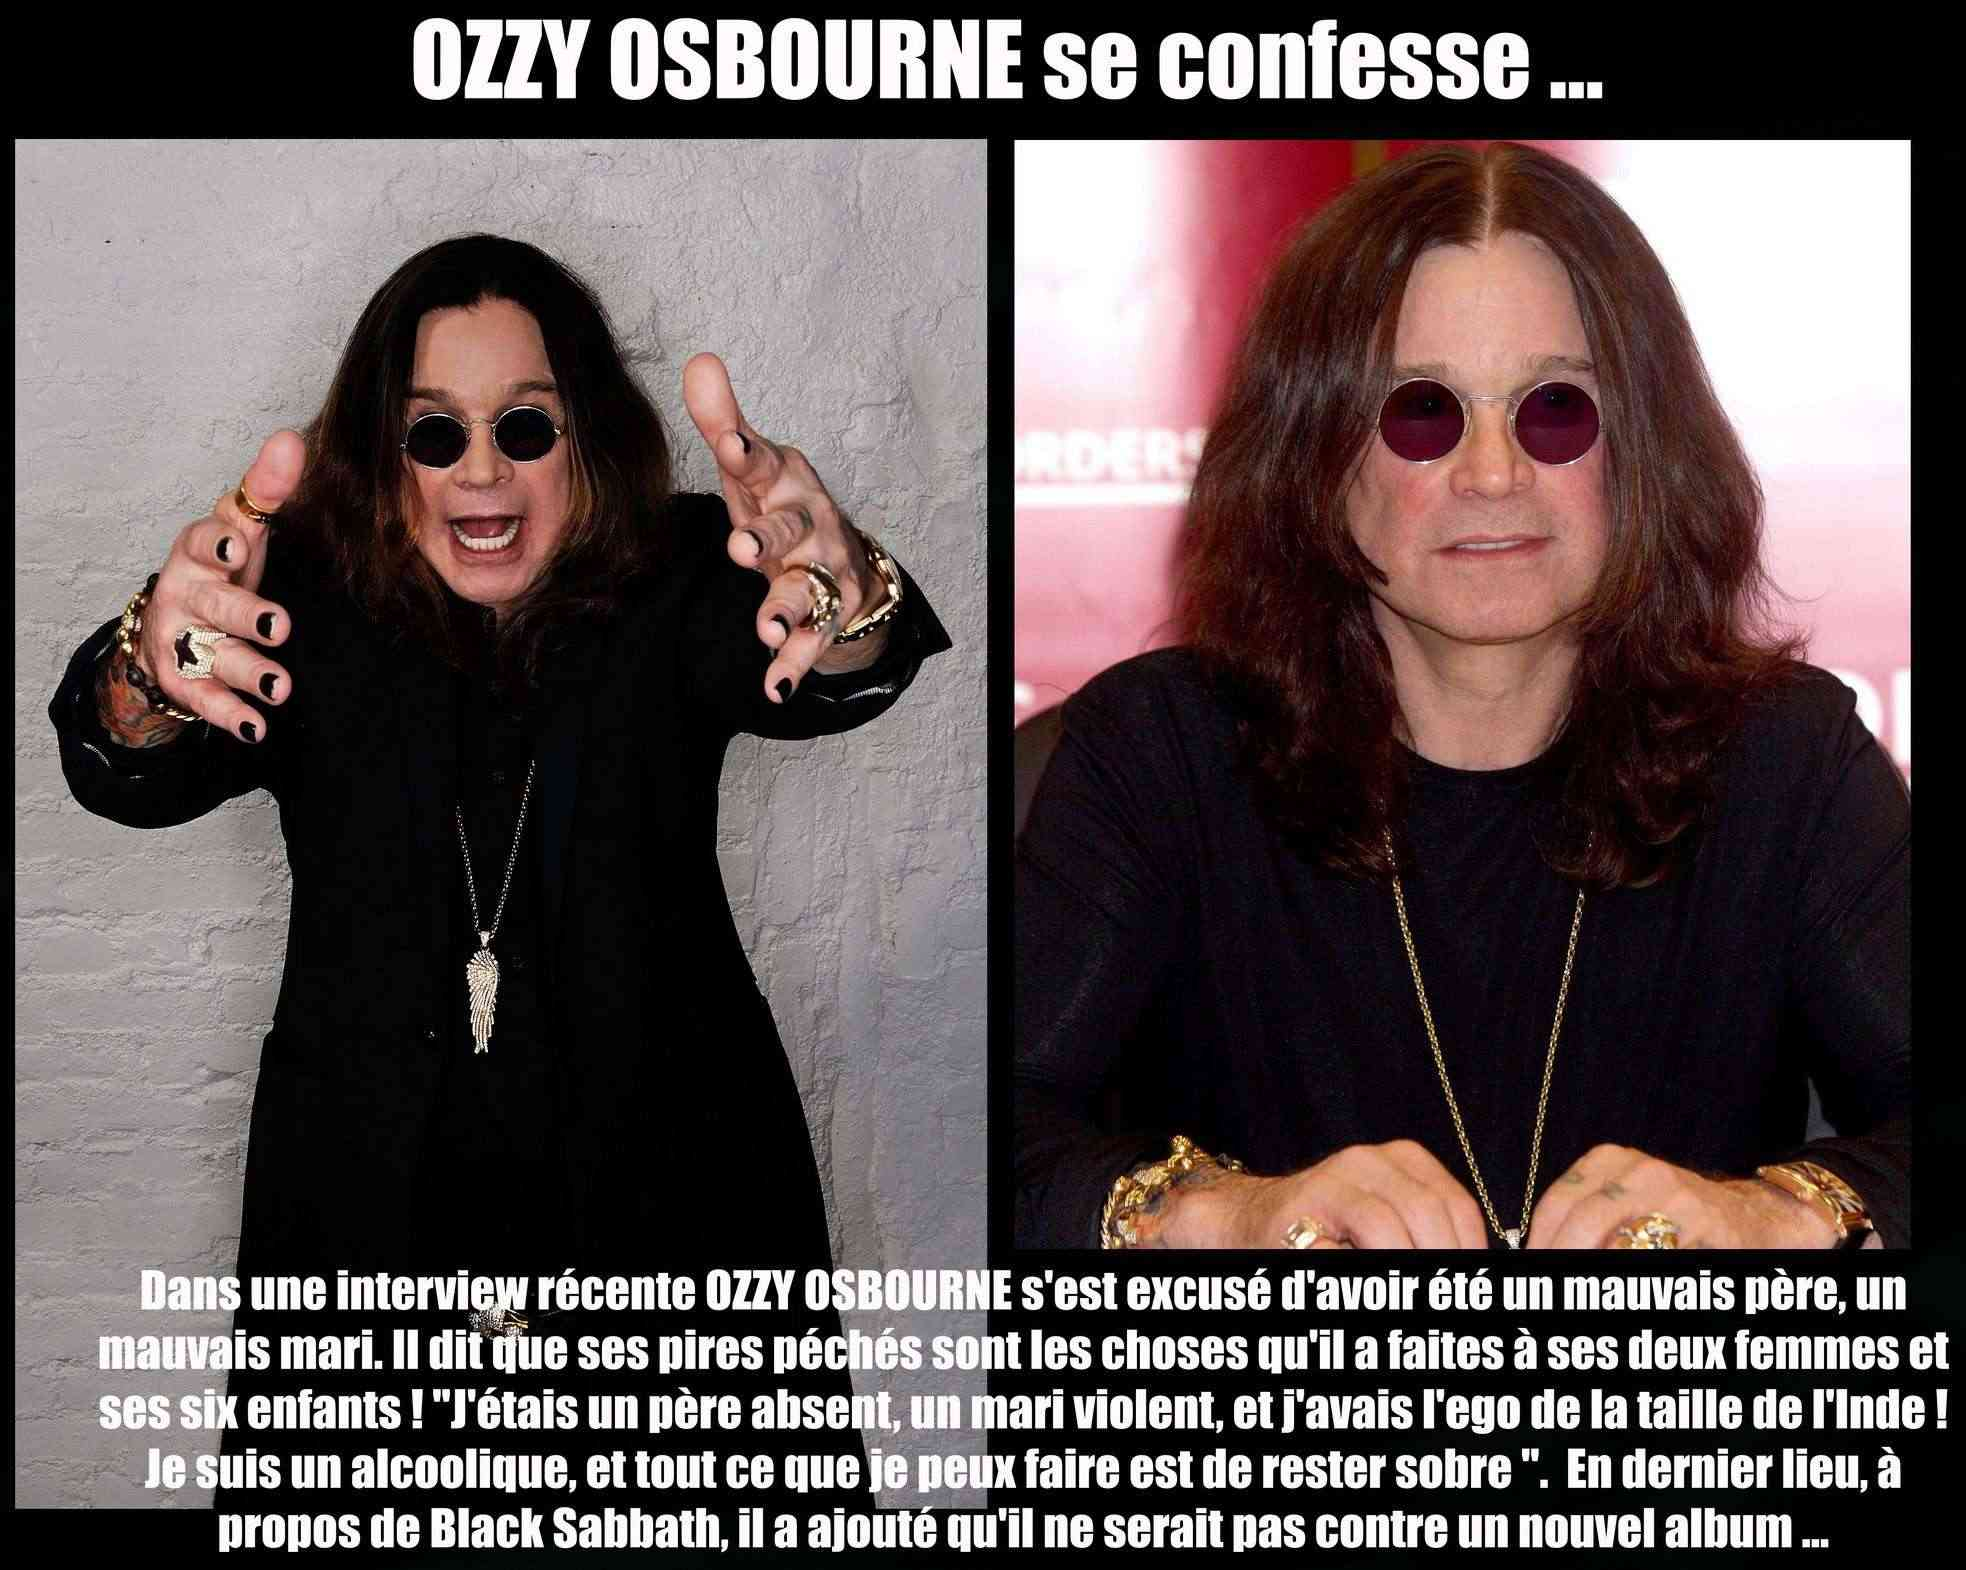 Les NEWS du METAL en VRAC ... - Page 4 Ozzy_o10